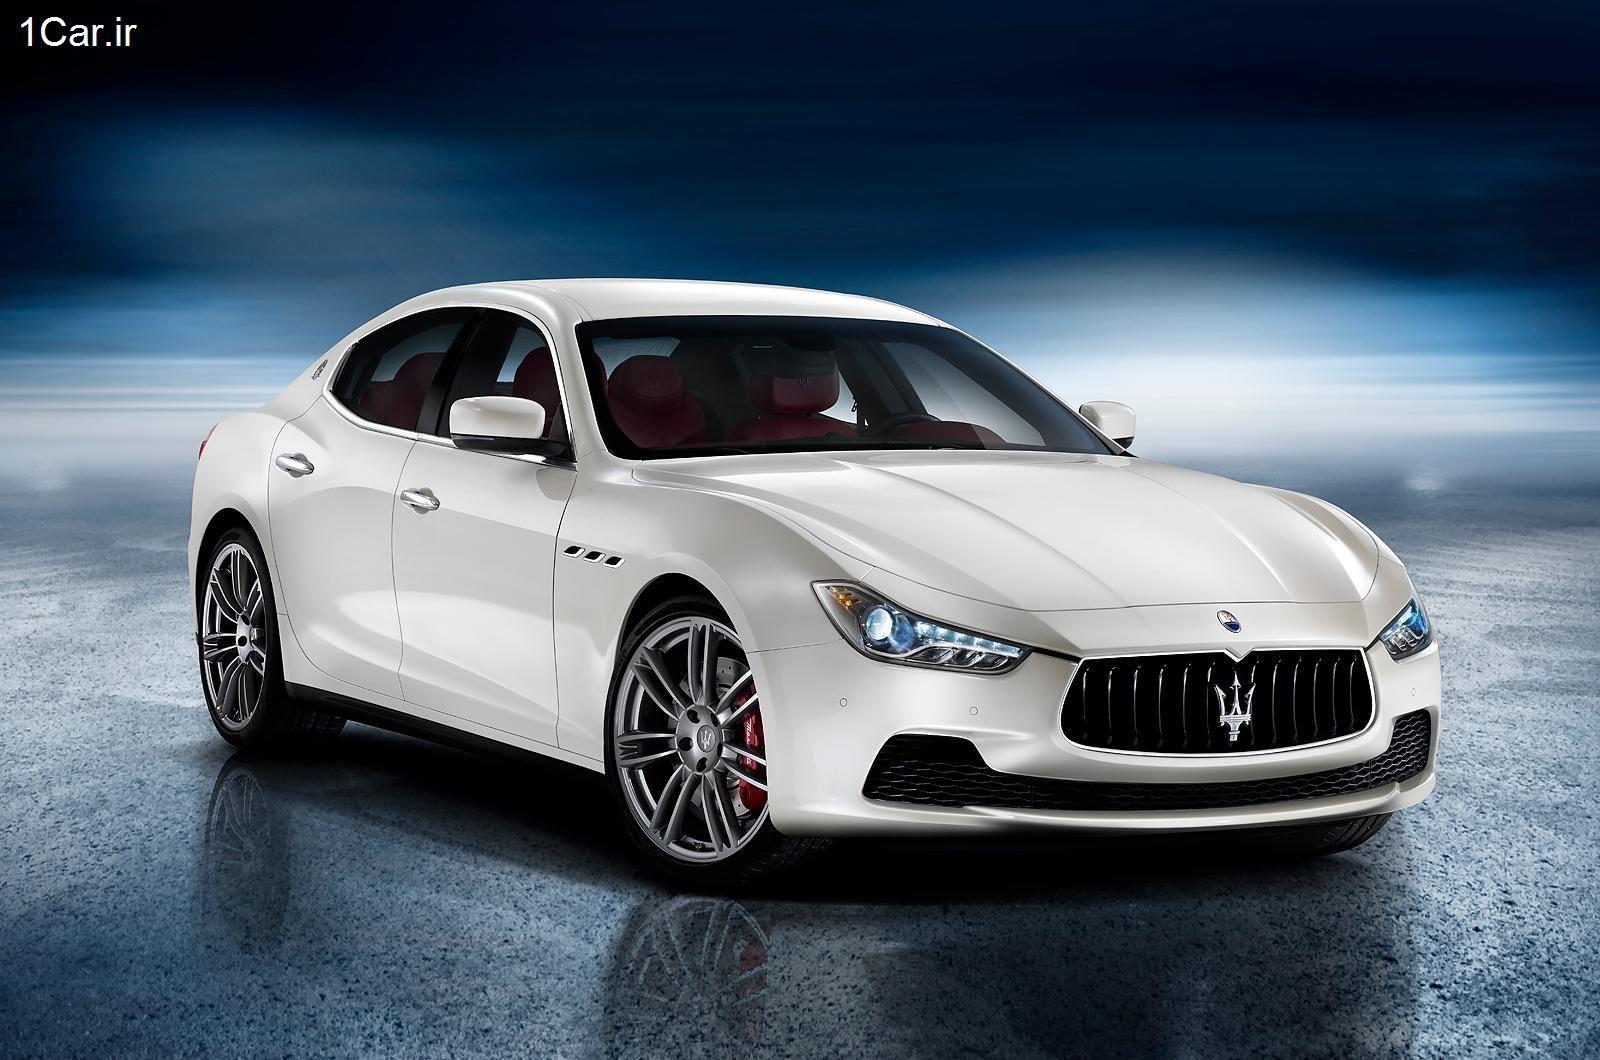 Ghiblimaserati2015 Maserati ghibli, Maserati ghibli